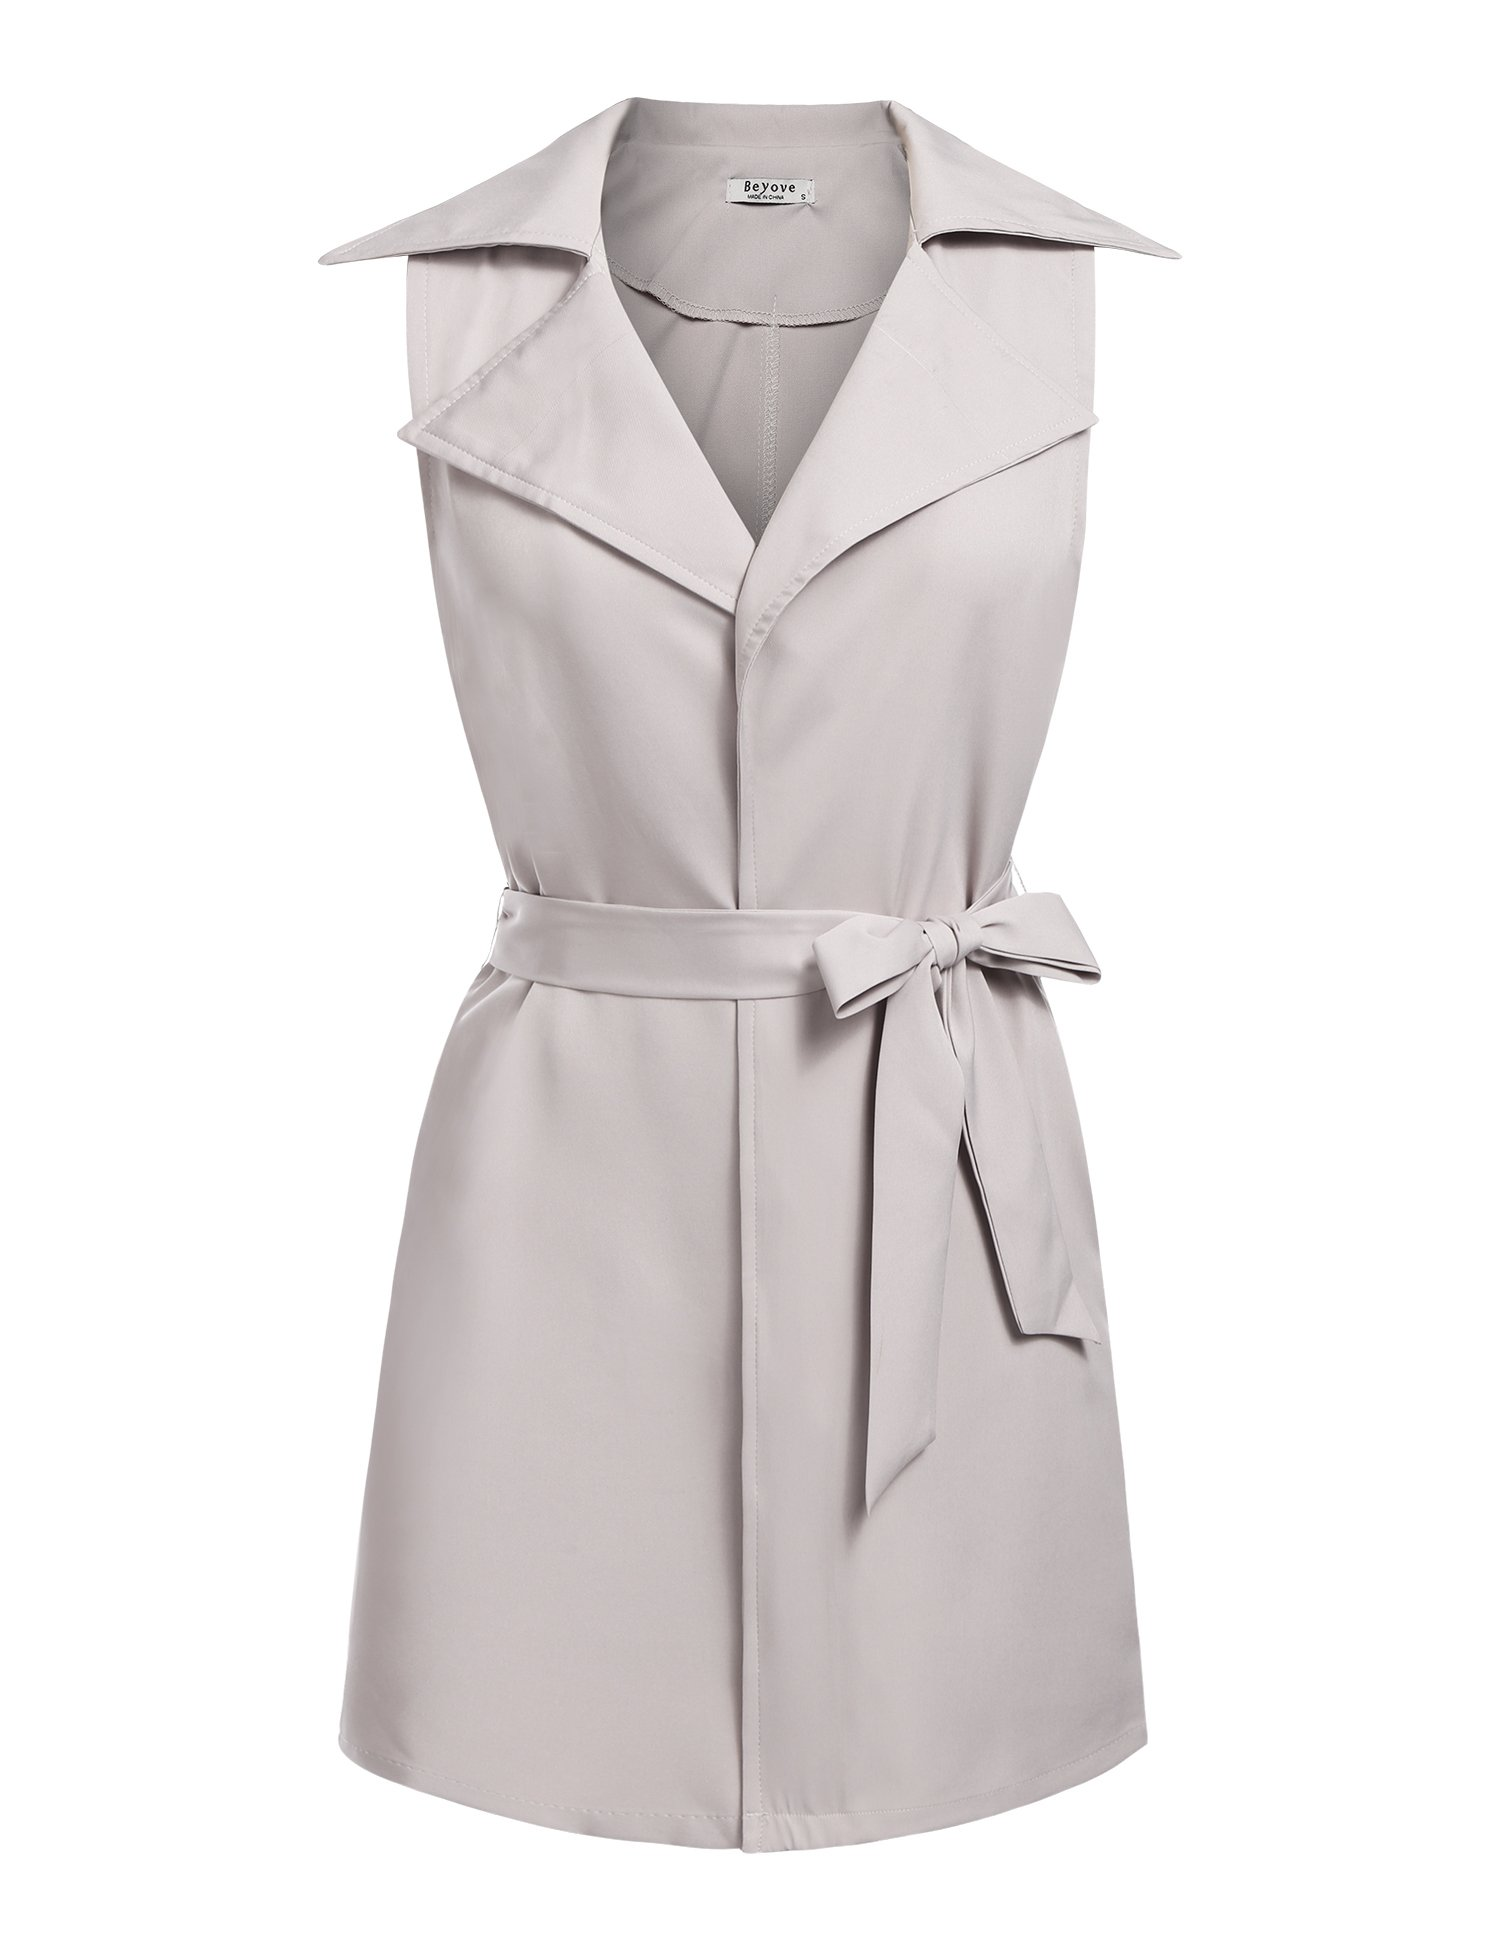 Beyove Women's Sleeveless Pocket Long Waistcoat Belt Blazer Jacket Cardigan Top